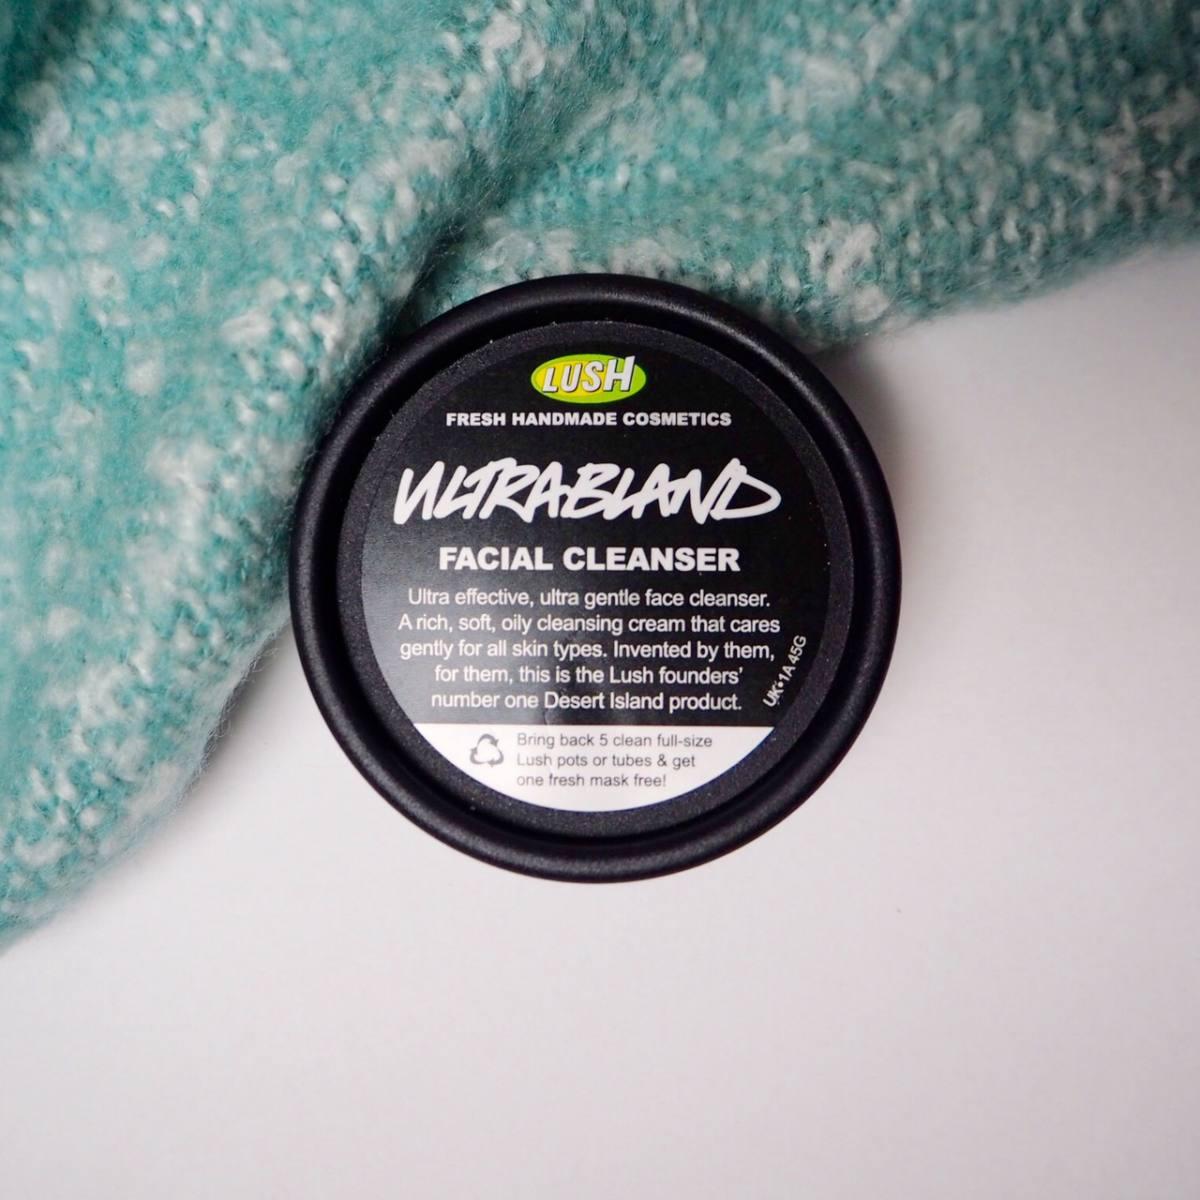 ultrabland cleanser